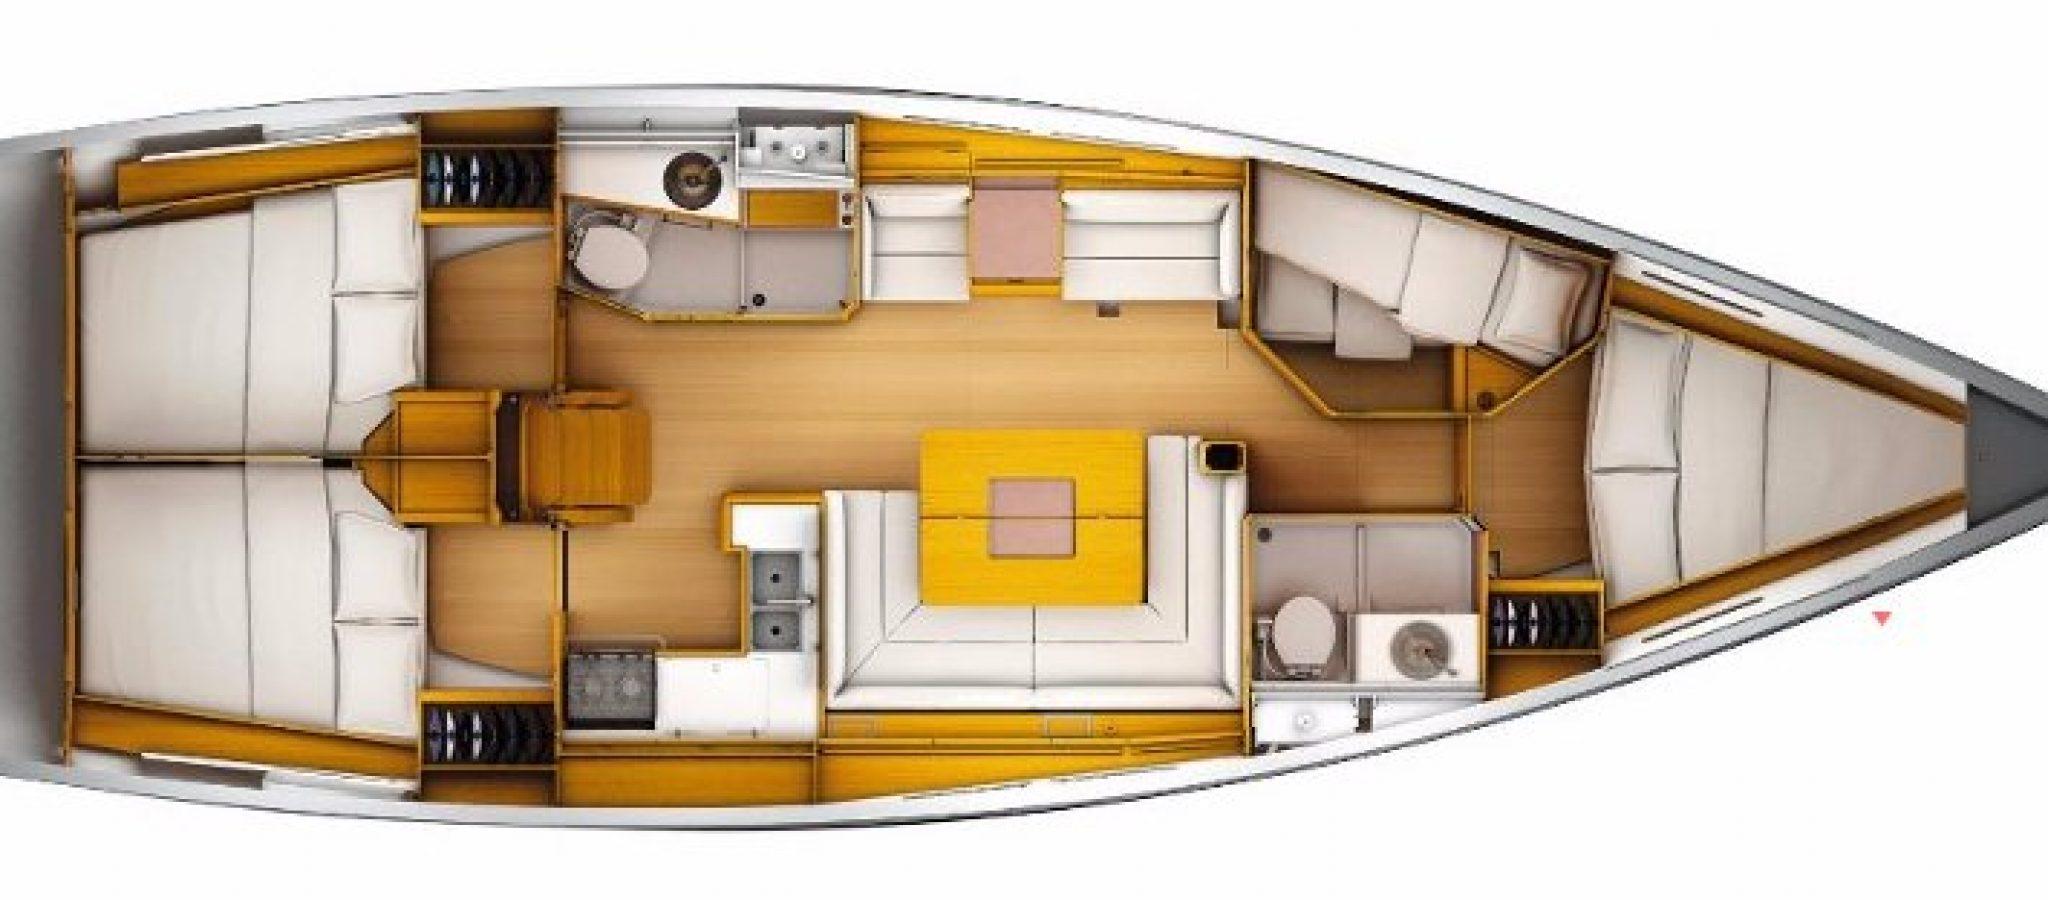 Sun Odyssey 449 plan 4 cabines